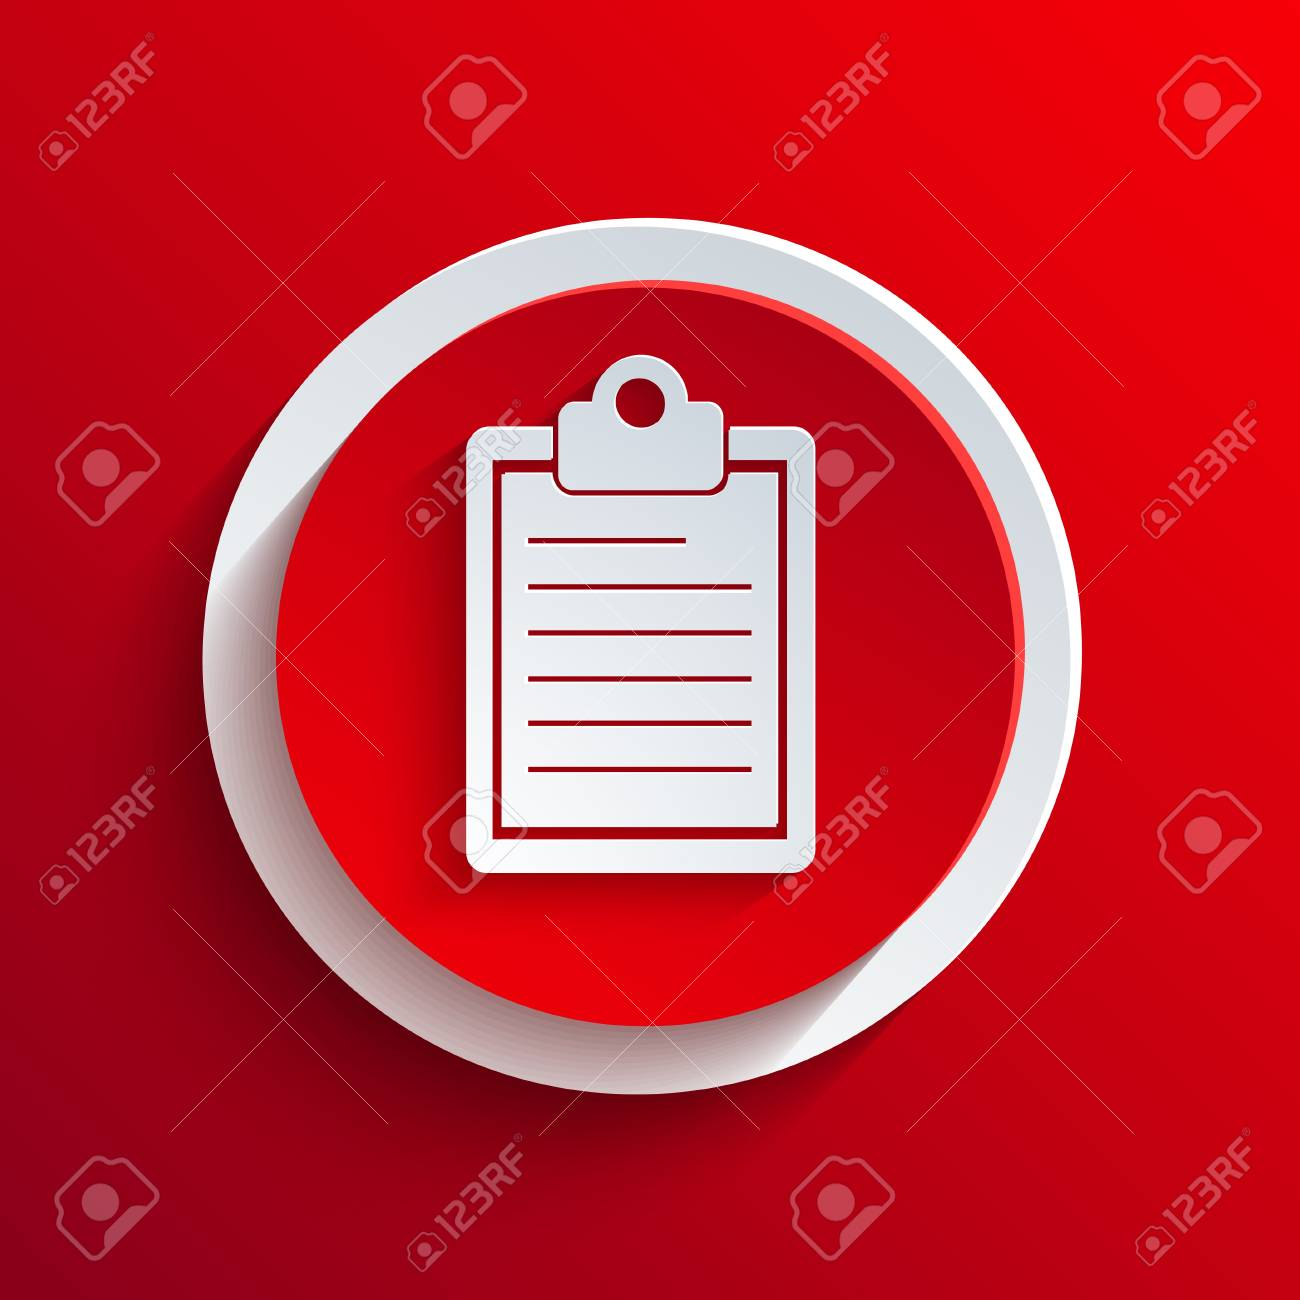 Vector red circle icon. Stock Vector - 21377213